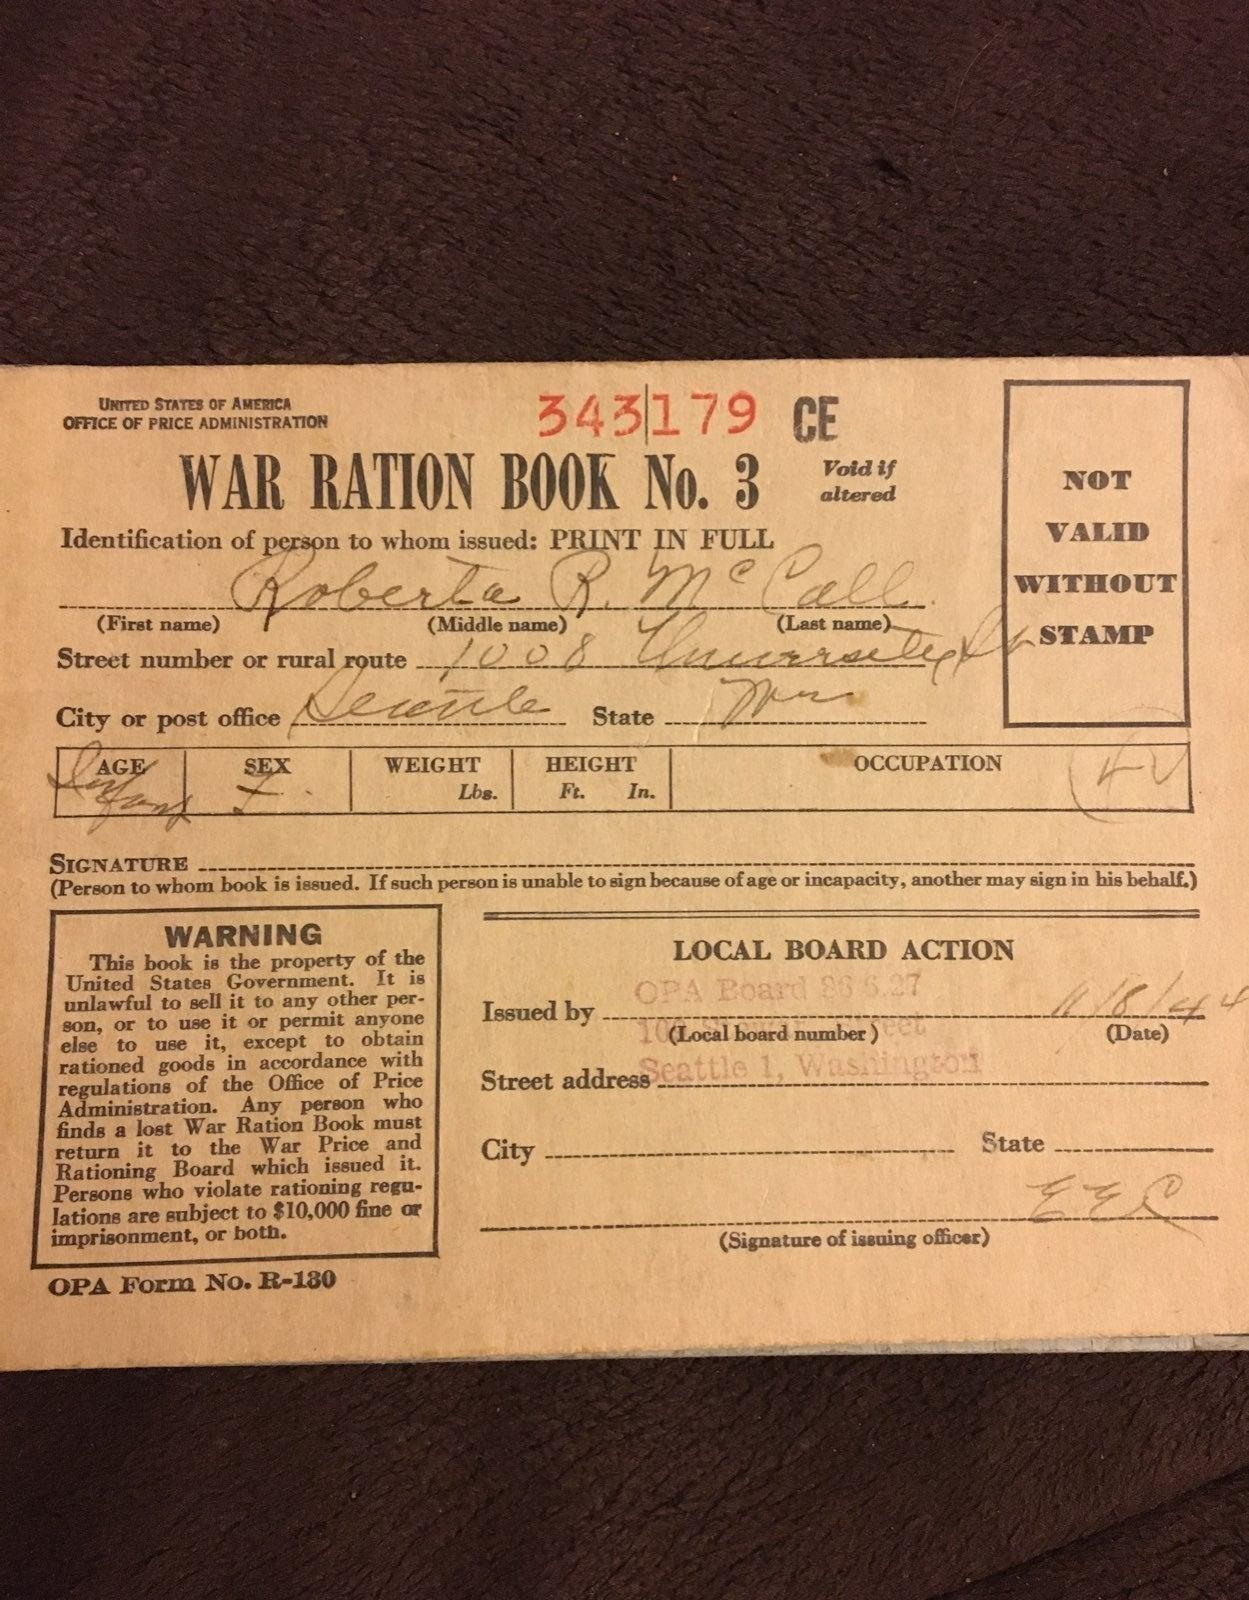 1944 war ration book No.3